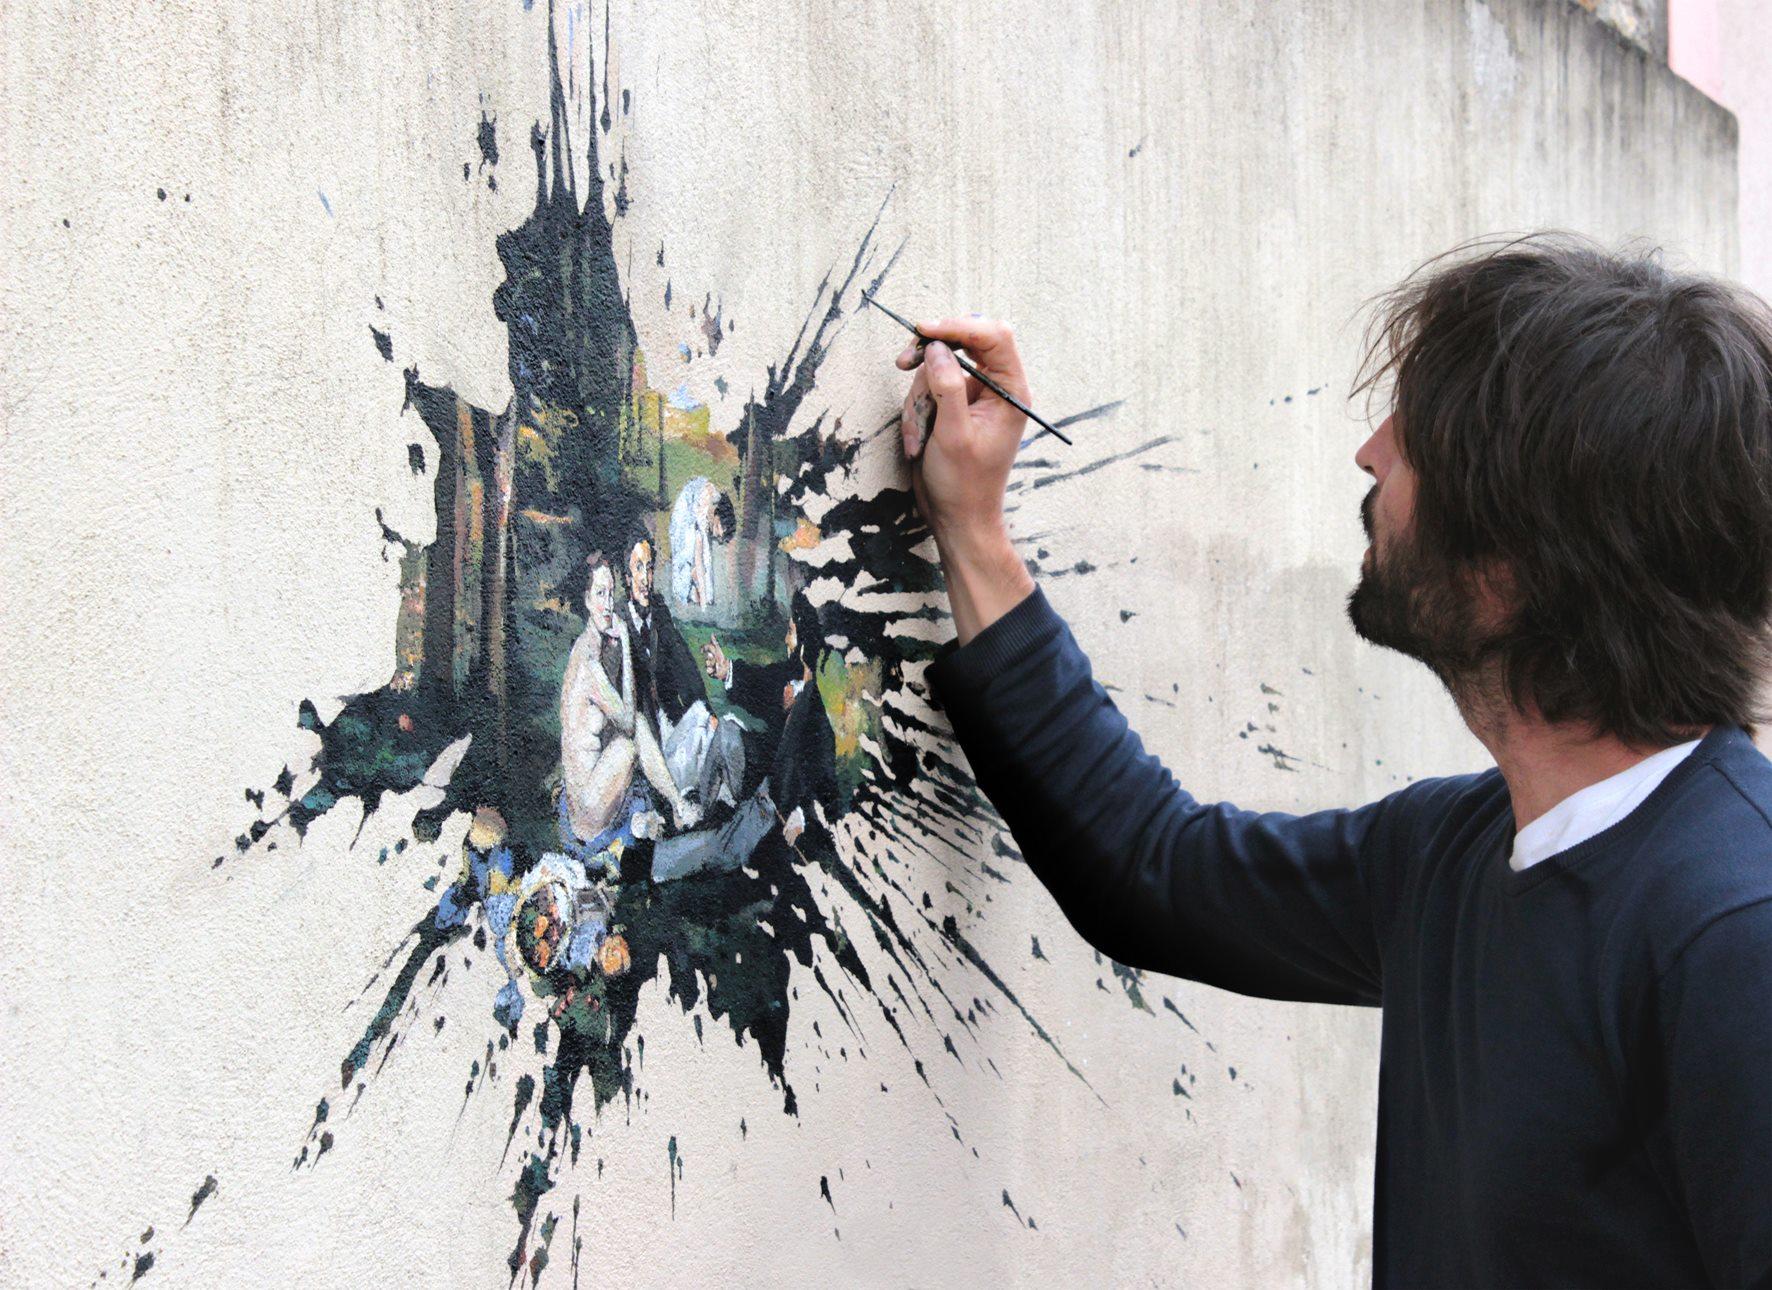 Creative-street-art-pejac-3